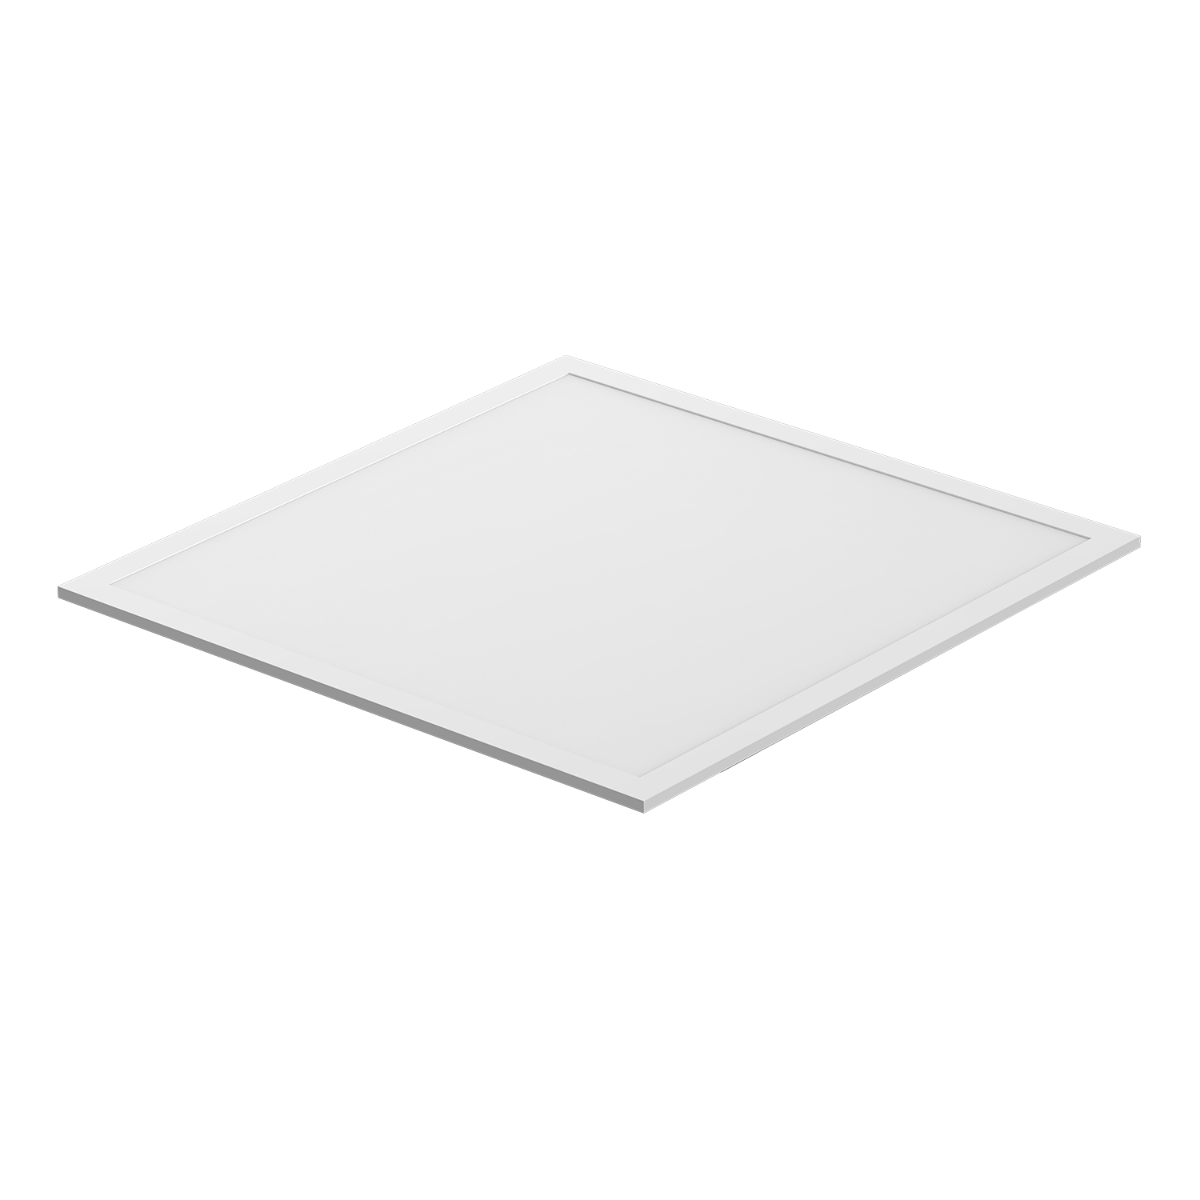 Noxion LED panel Econox 32W Xitanium DALI 60x60cm 6500K 4400lm UGR <22   Dali dæmpbar - dagslys - erstatter 4x18W